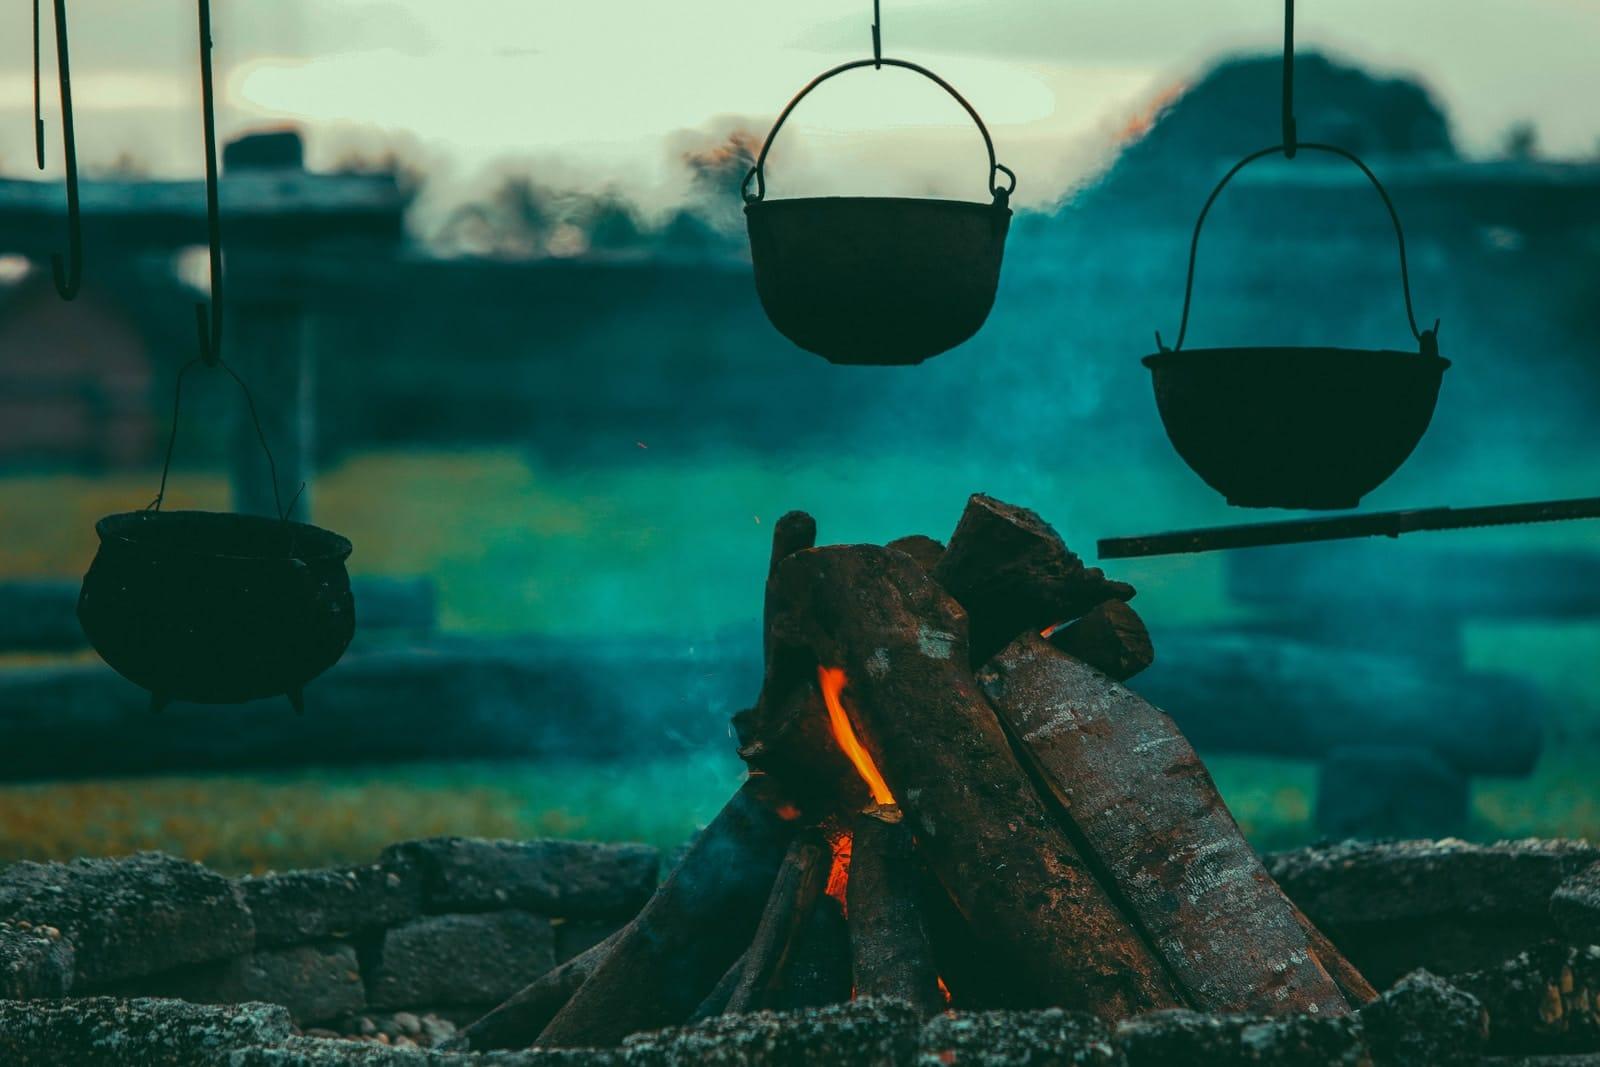 three hanging pots